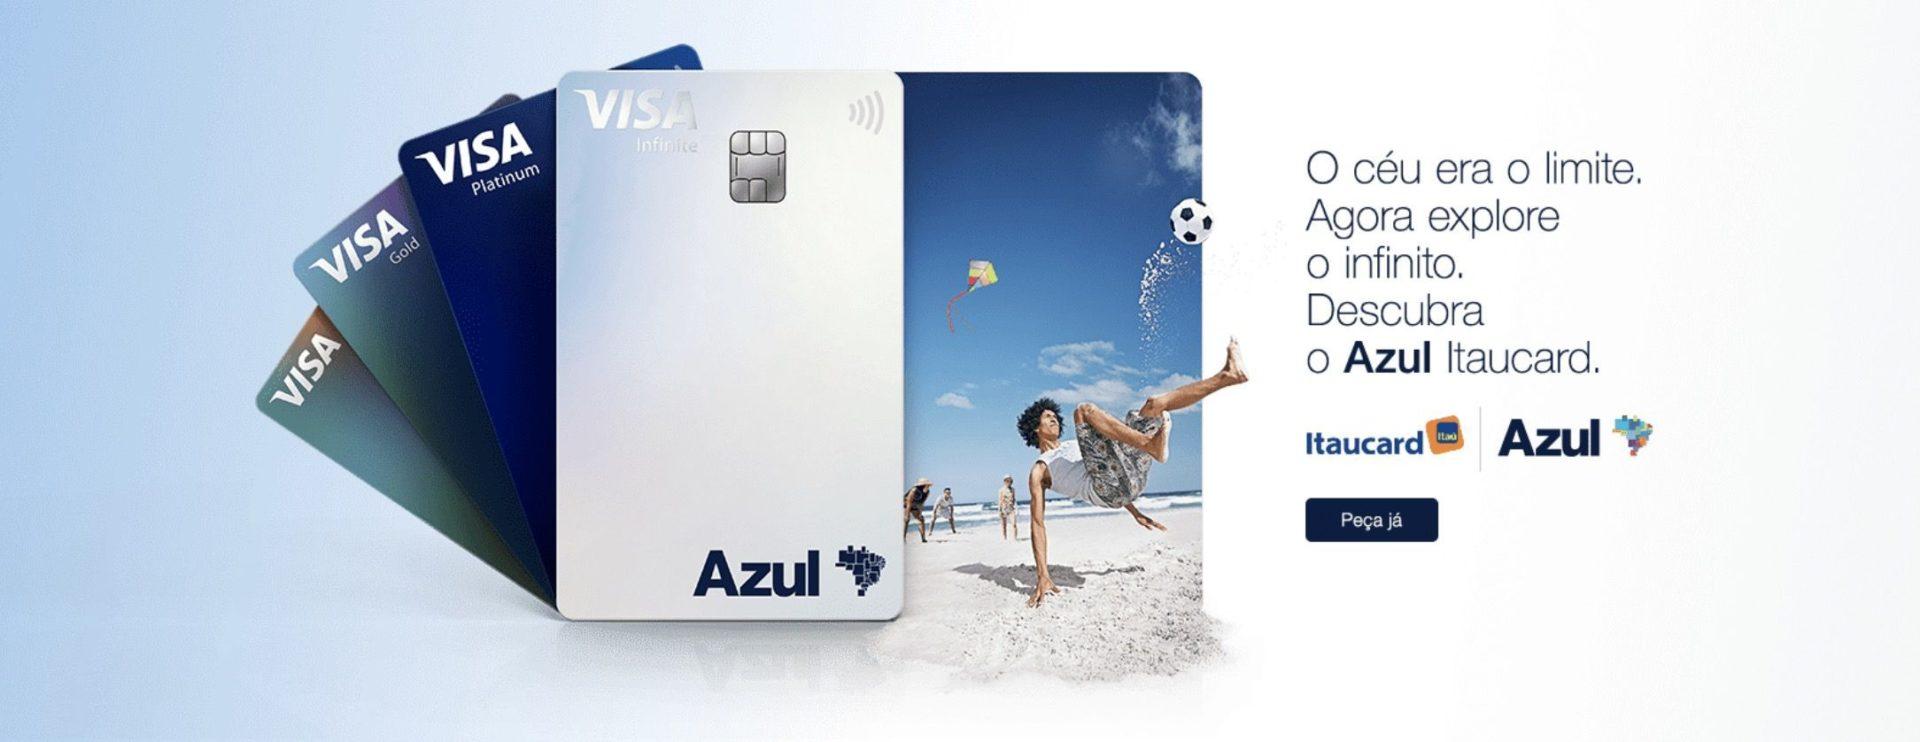 Azul Itaucard Visa Infinite